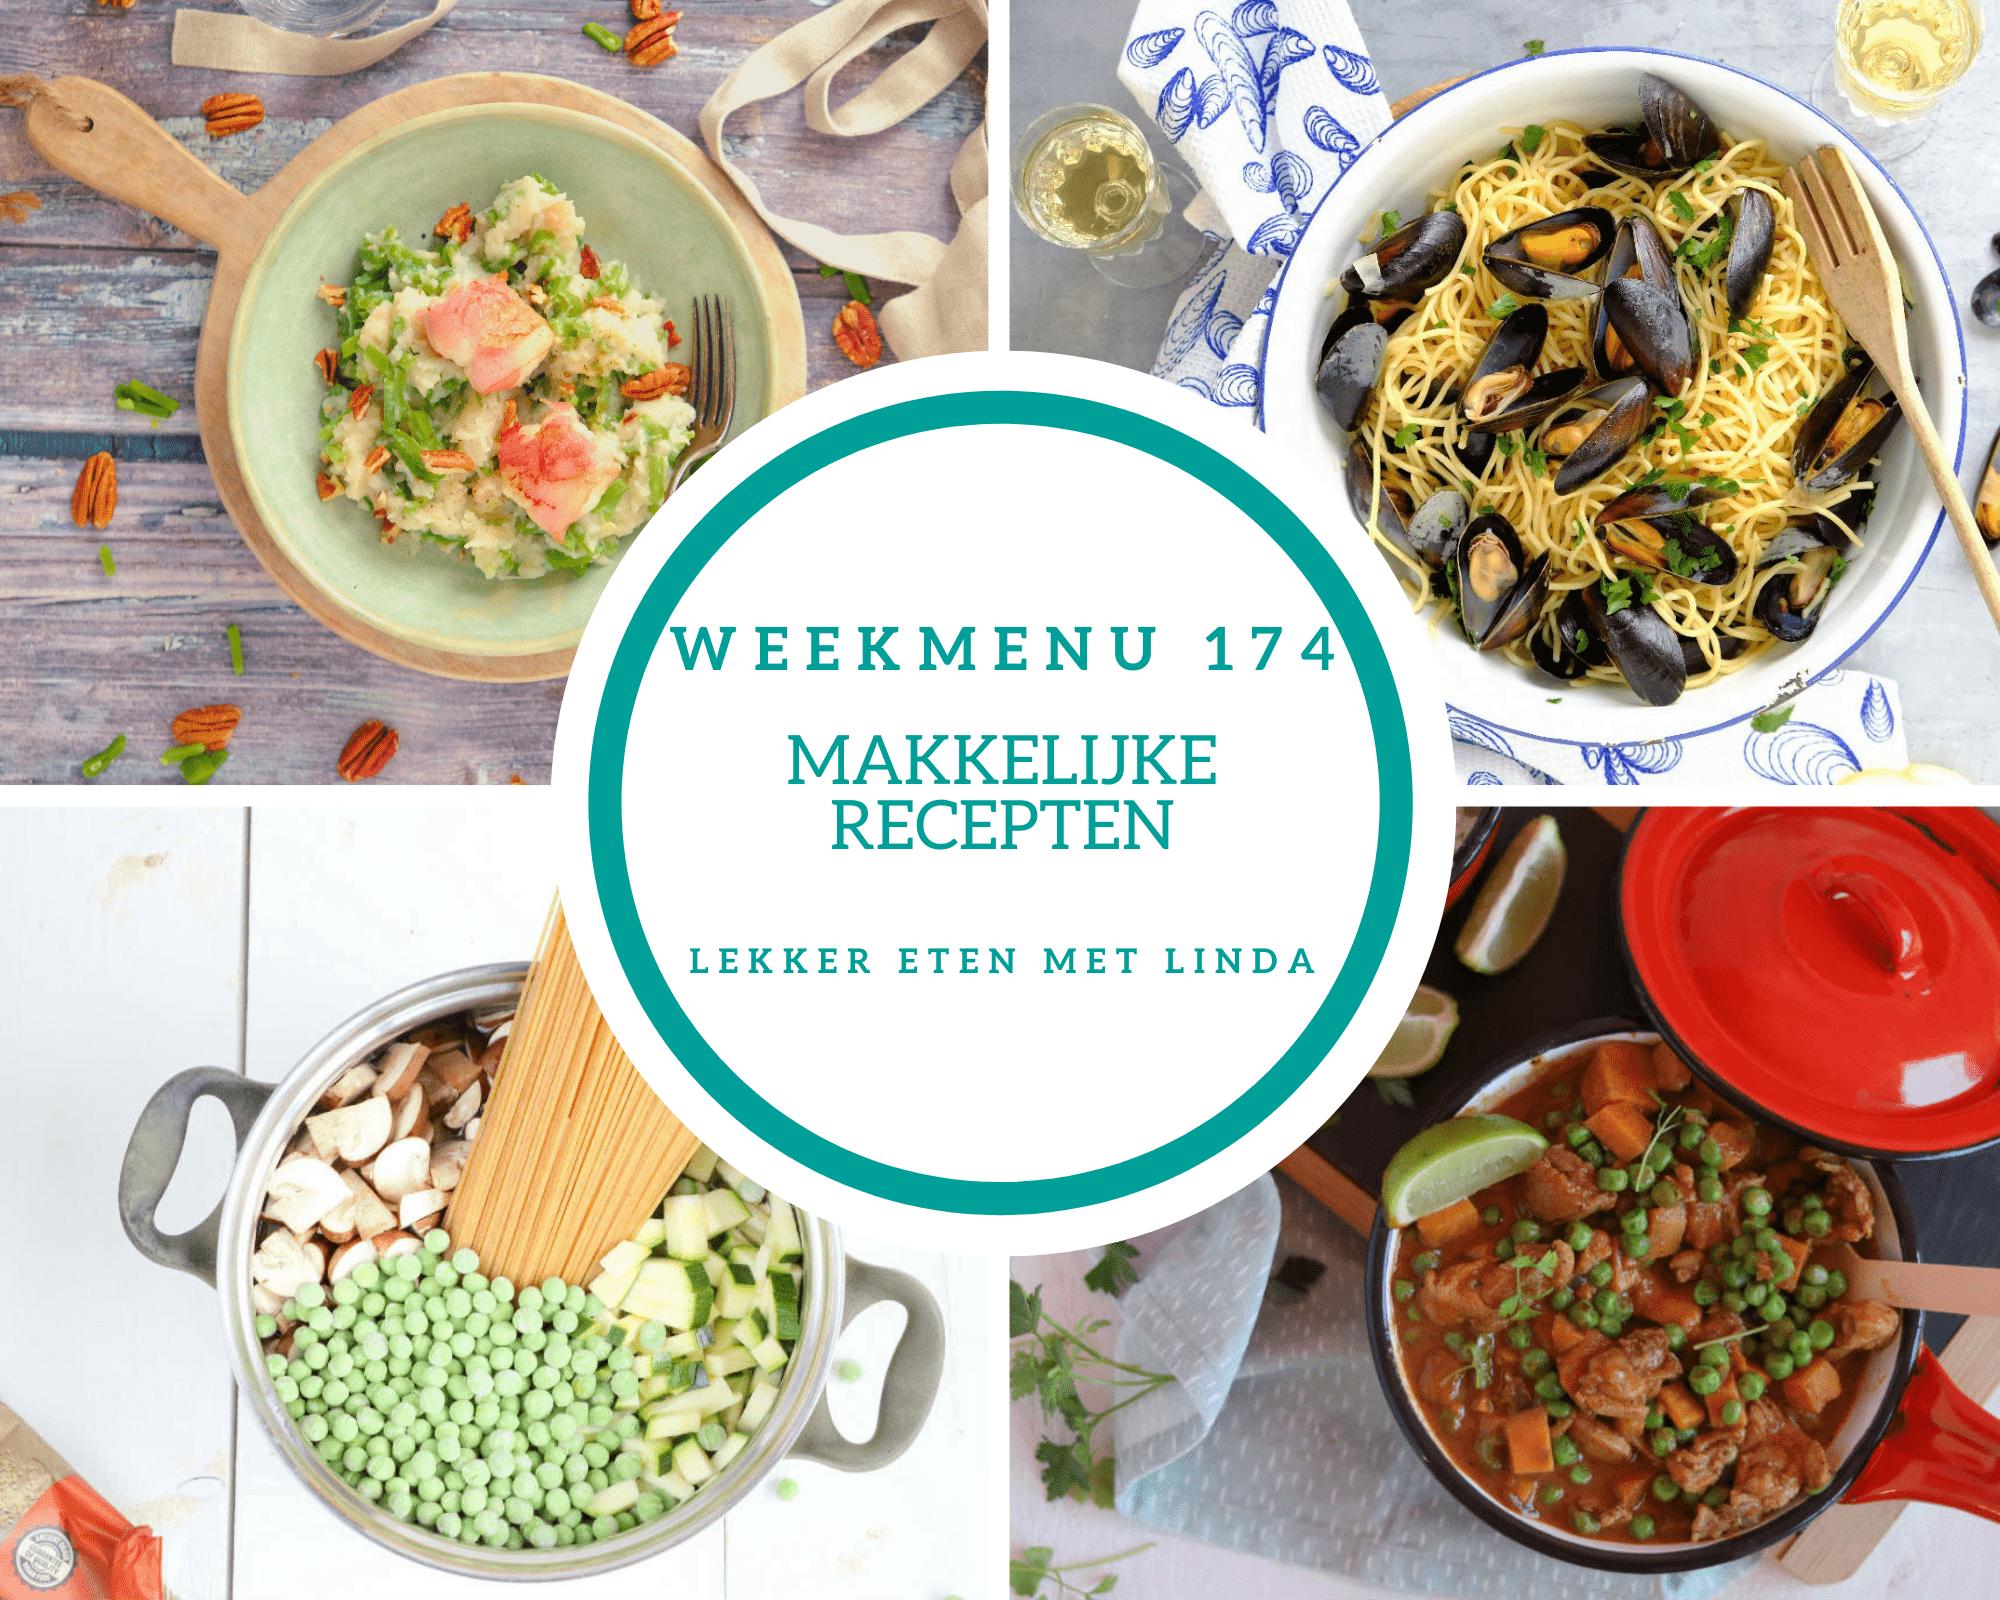 Weekmenu 174 makkelijke recepten